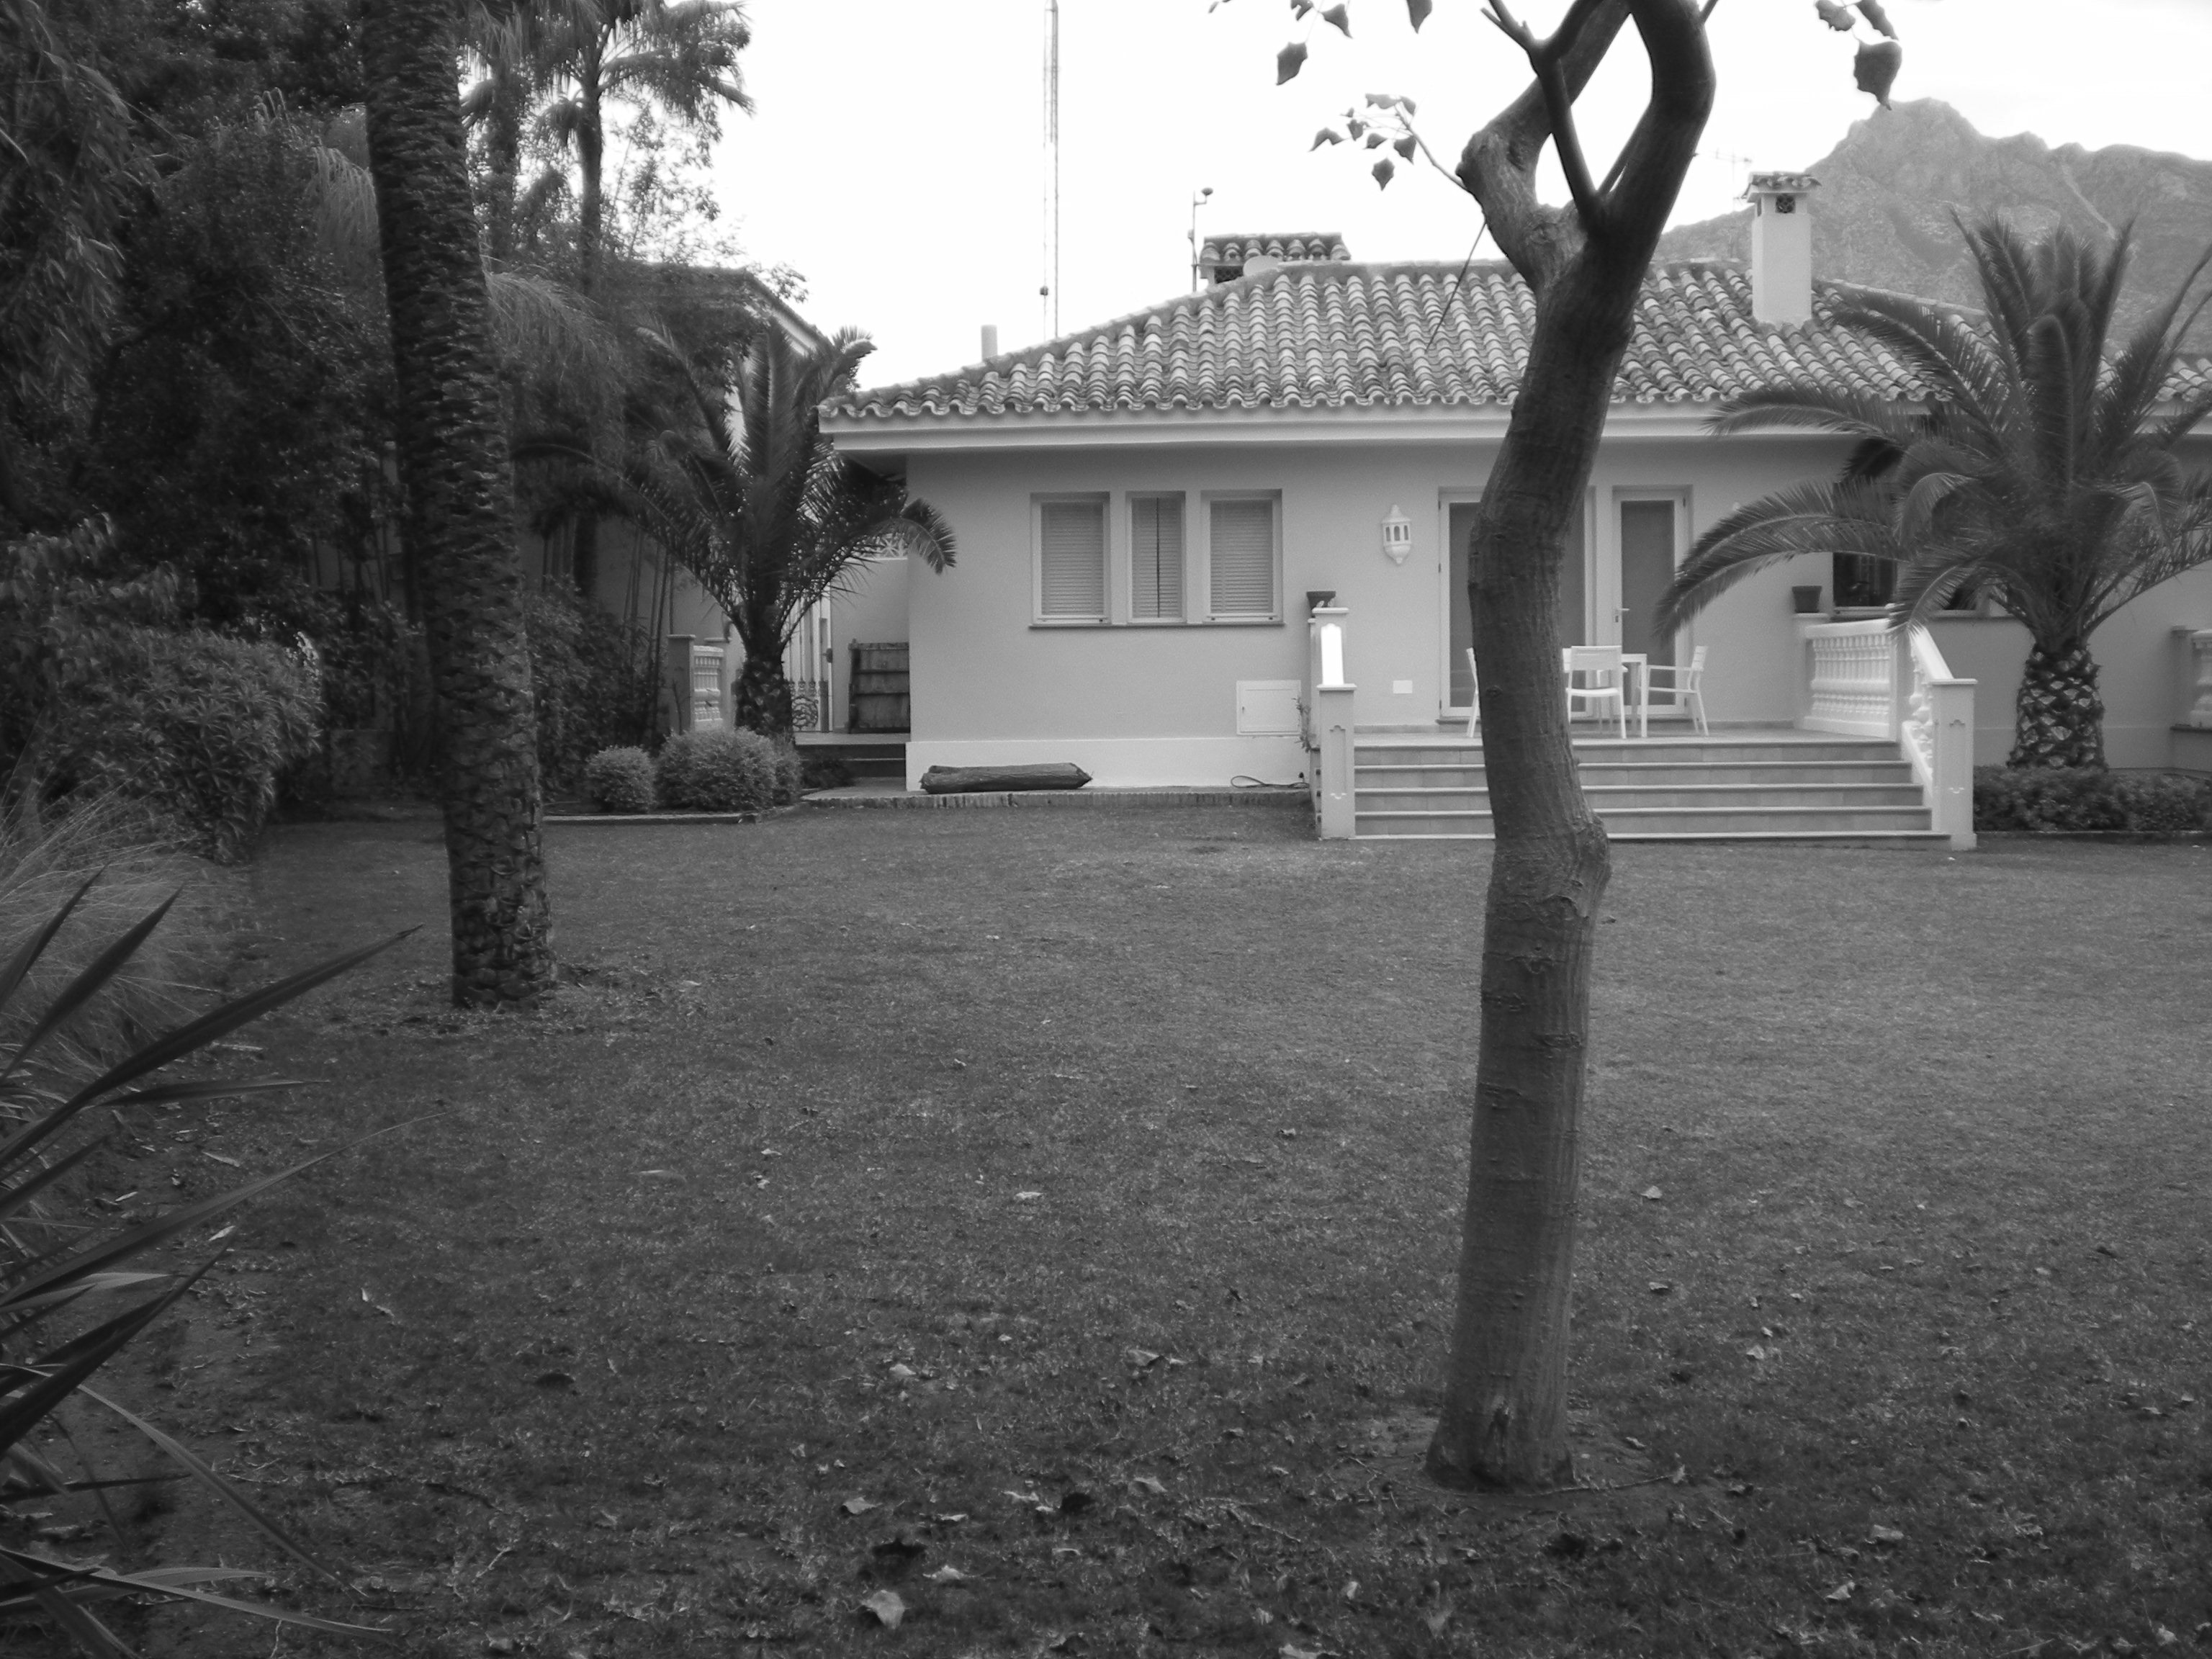 https://tobal.net/wp-content/uploads/2009/08/Los-Verdiales-Anterior-4.jpg